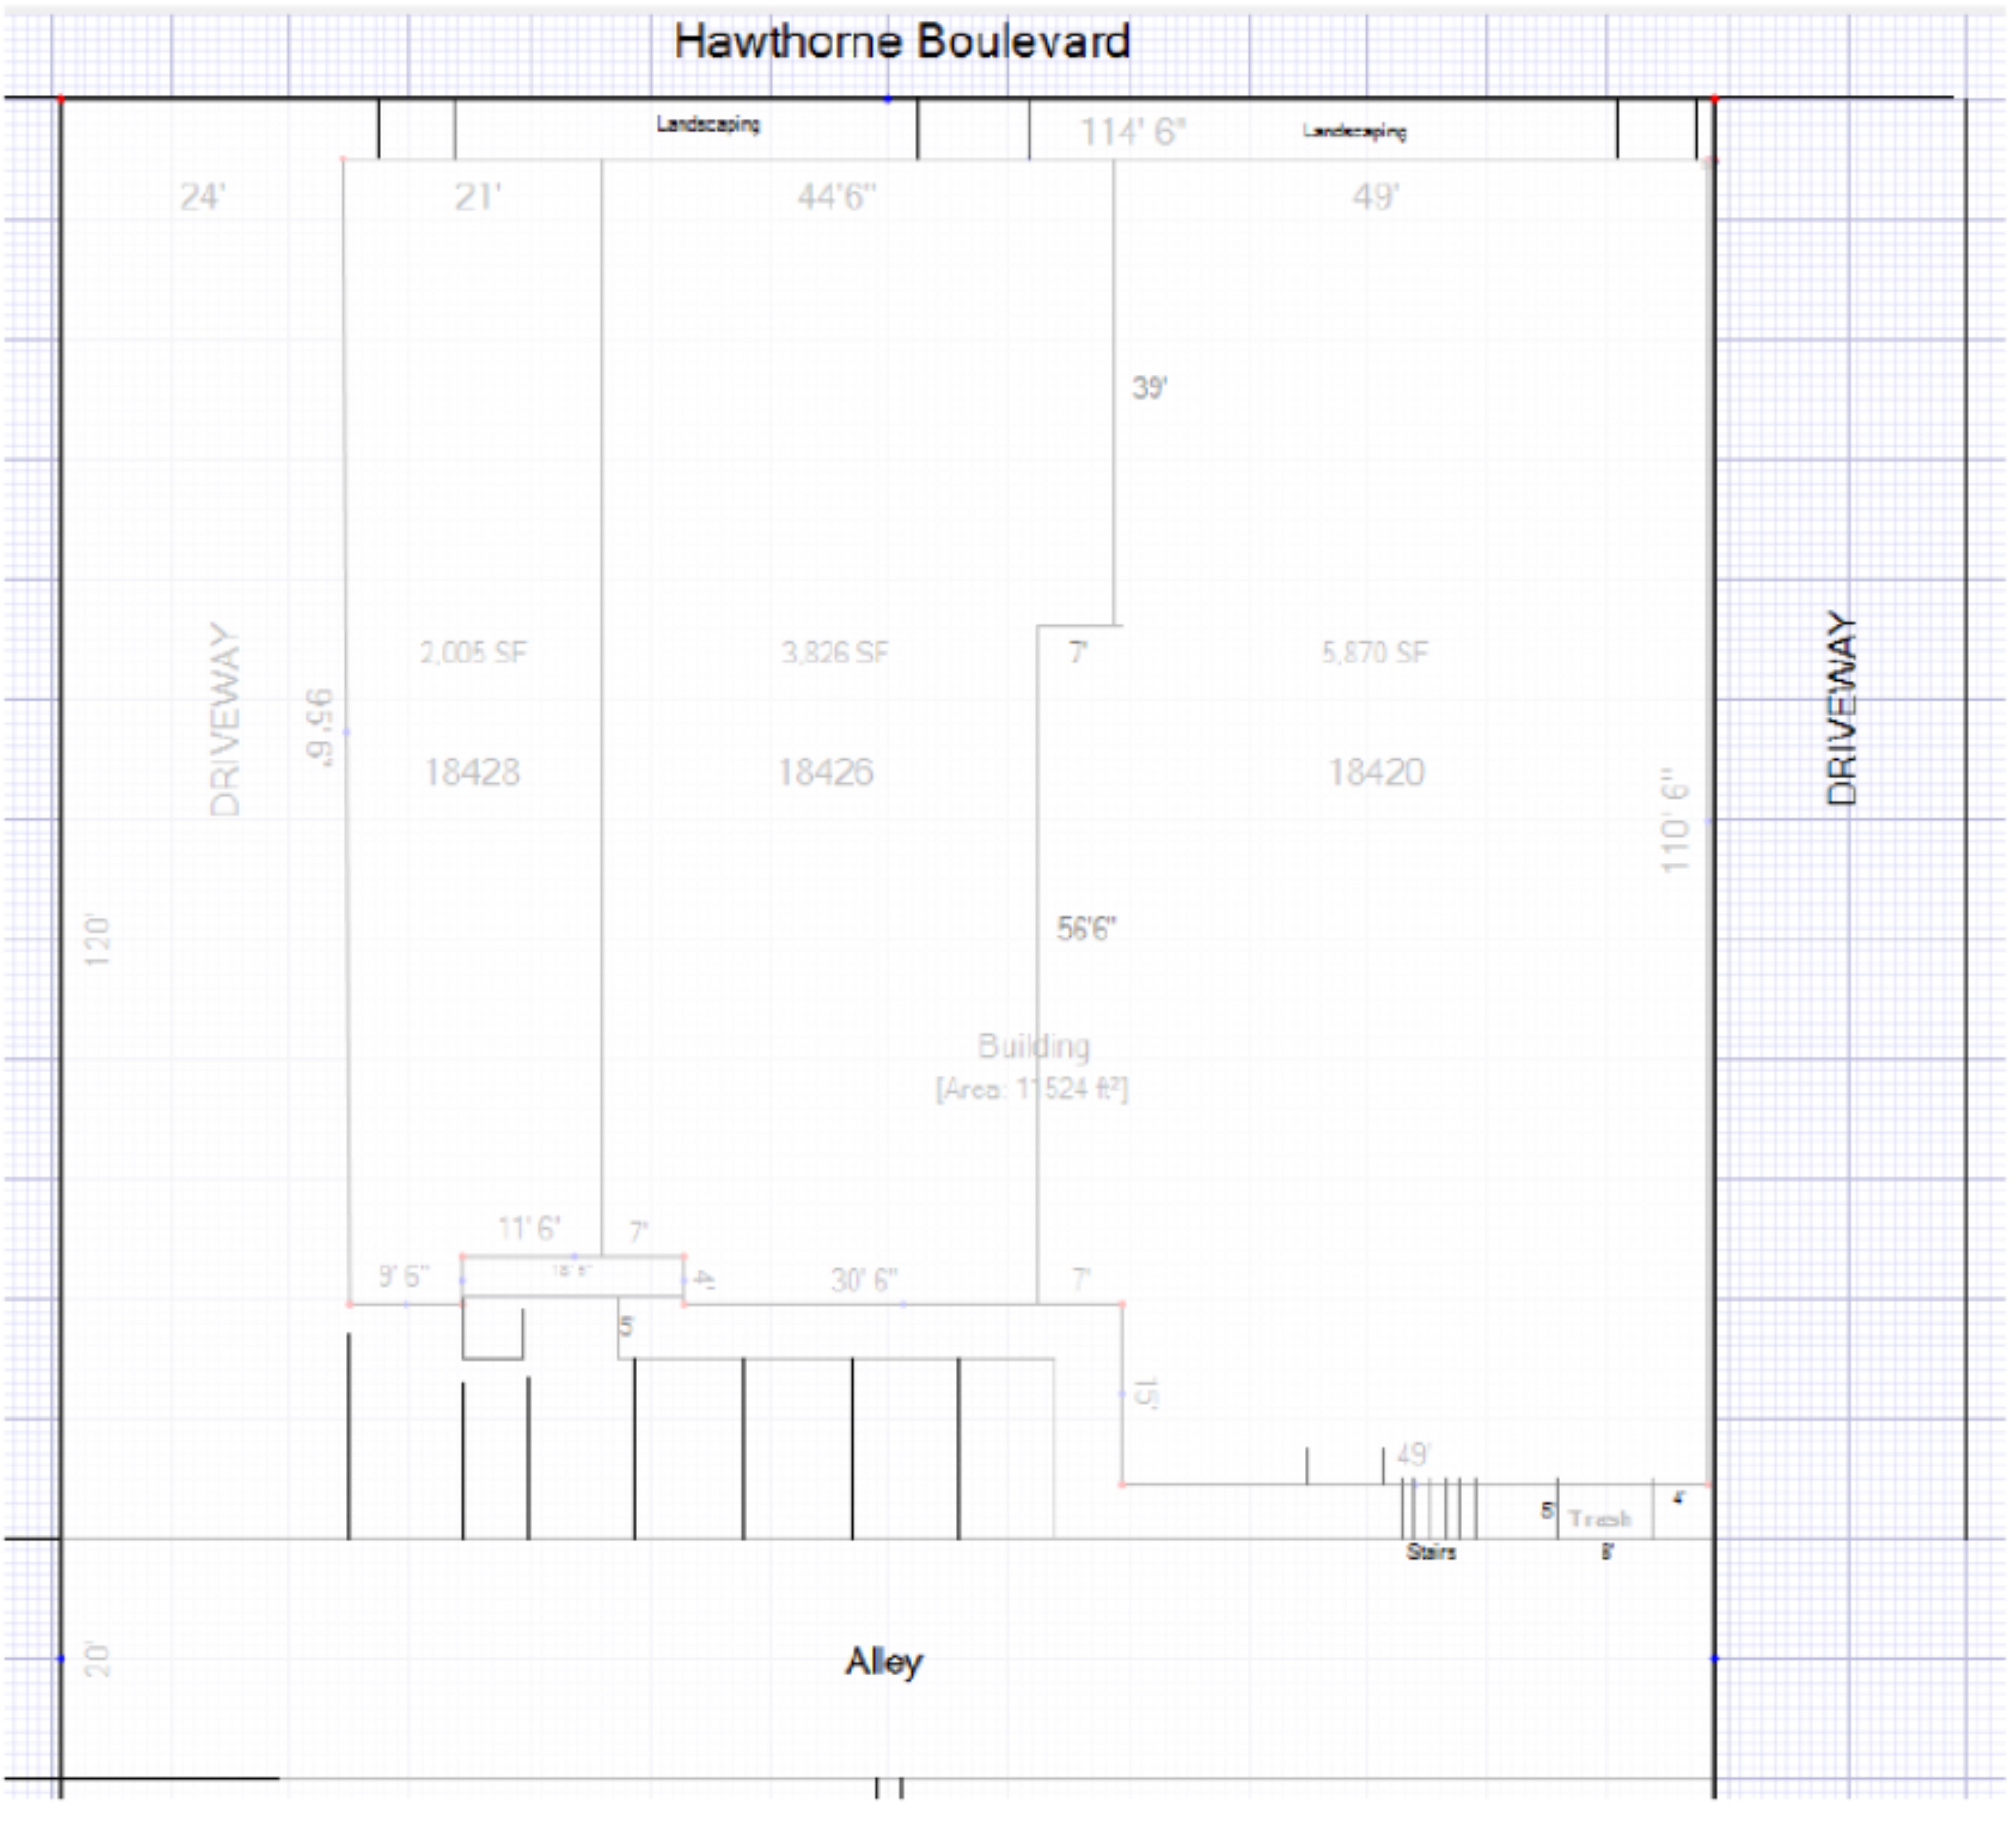 18420-18428 Hawthorne Boulevard: site plan